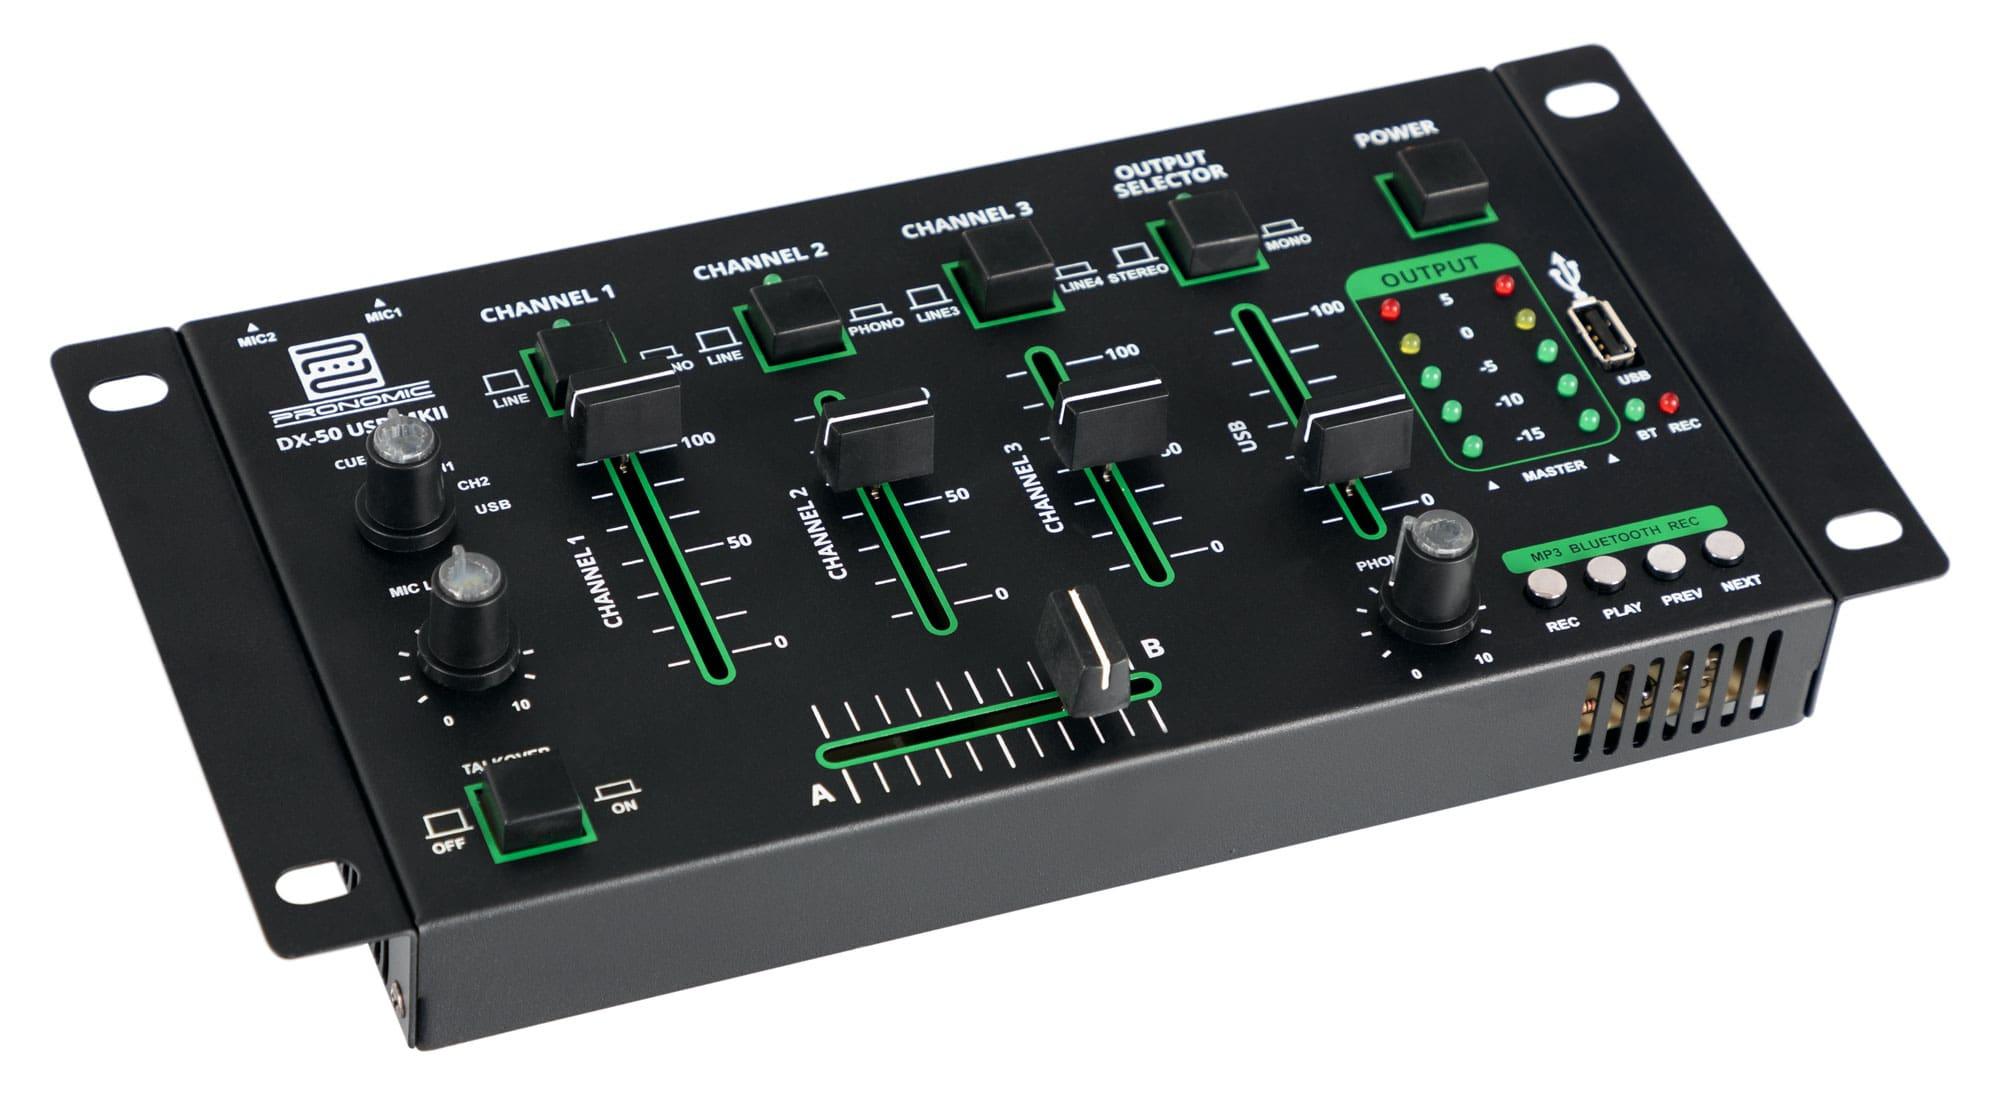 Pronomic DX 50 USB MKII 4 Kanal DJ Mixer mit Bluetooth